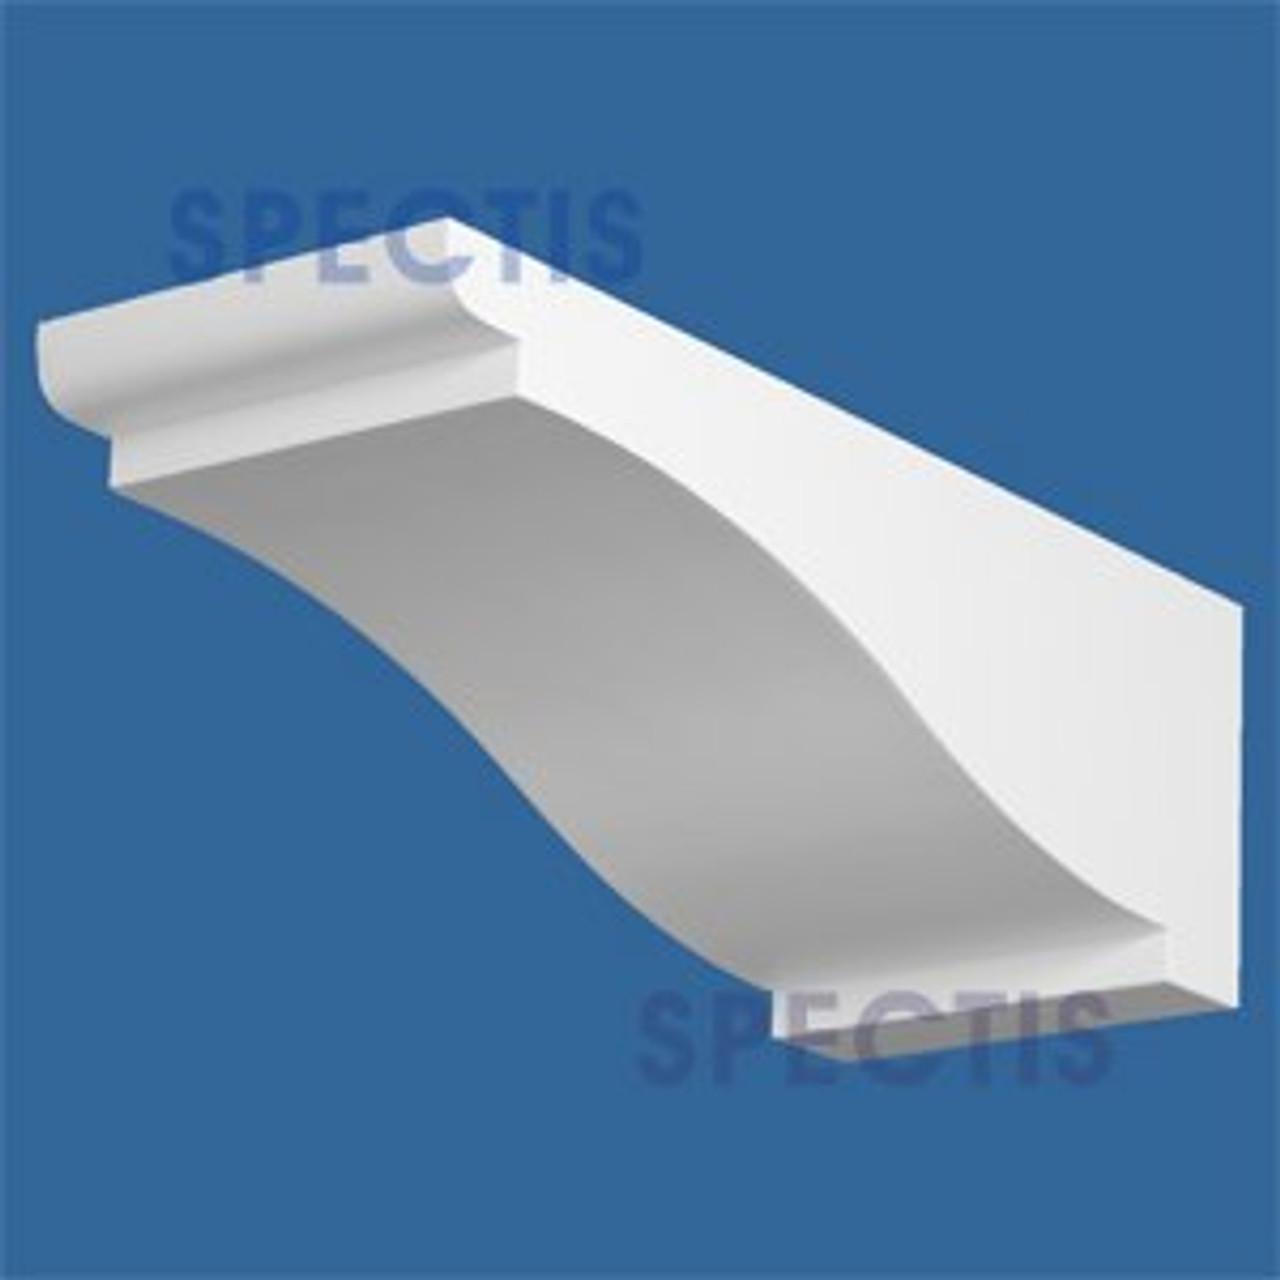 "BL2901 Corbel Block or Eave Bracket 7.25""W x 6.25""H x 18.5"" P"